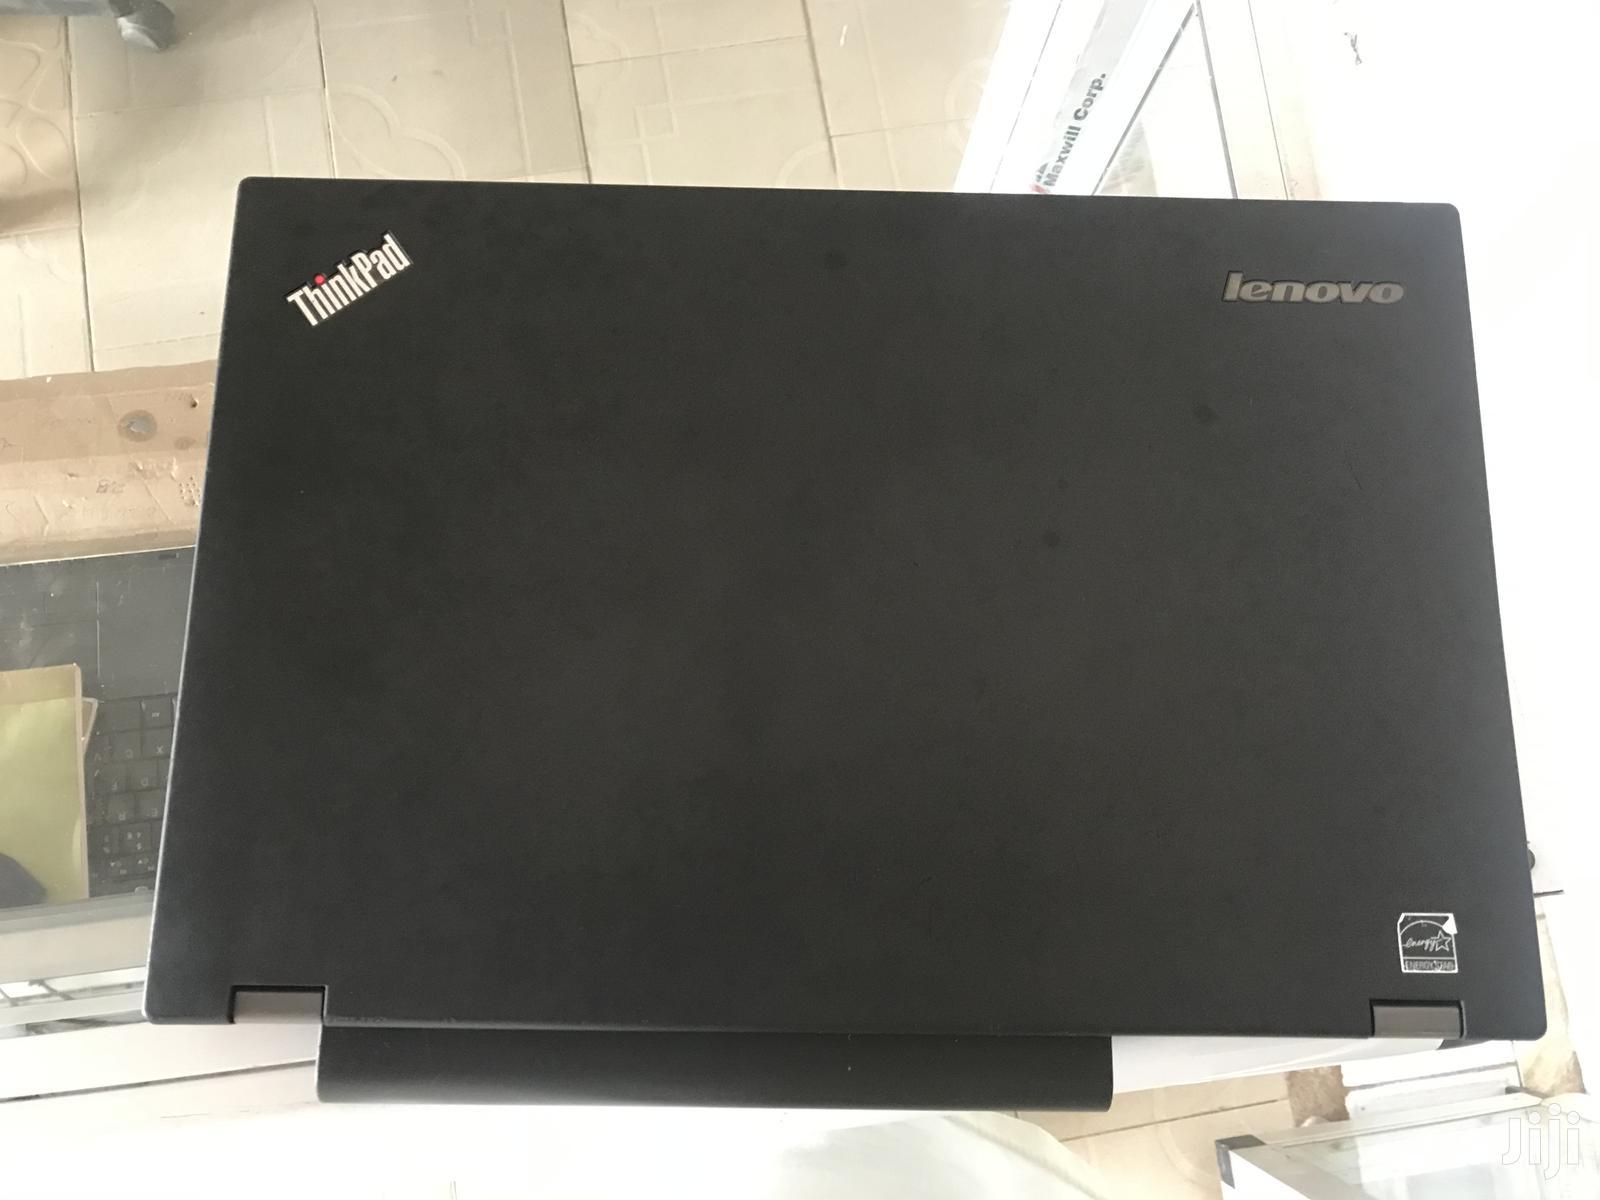 Archive: Laptop Lenovo ThinkPad T540p 4GB Intel Core i5 HDD 500GB